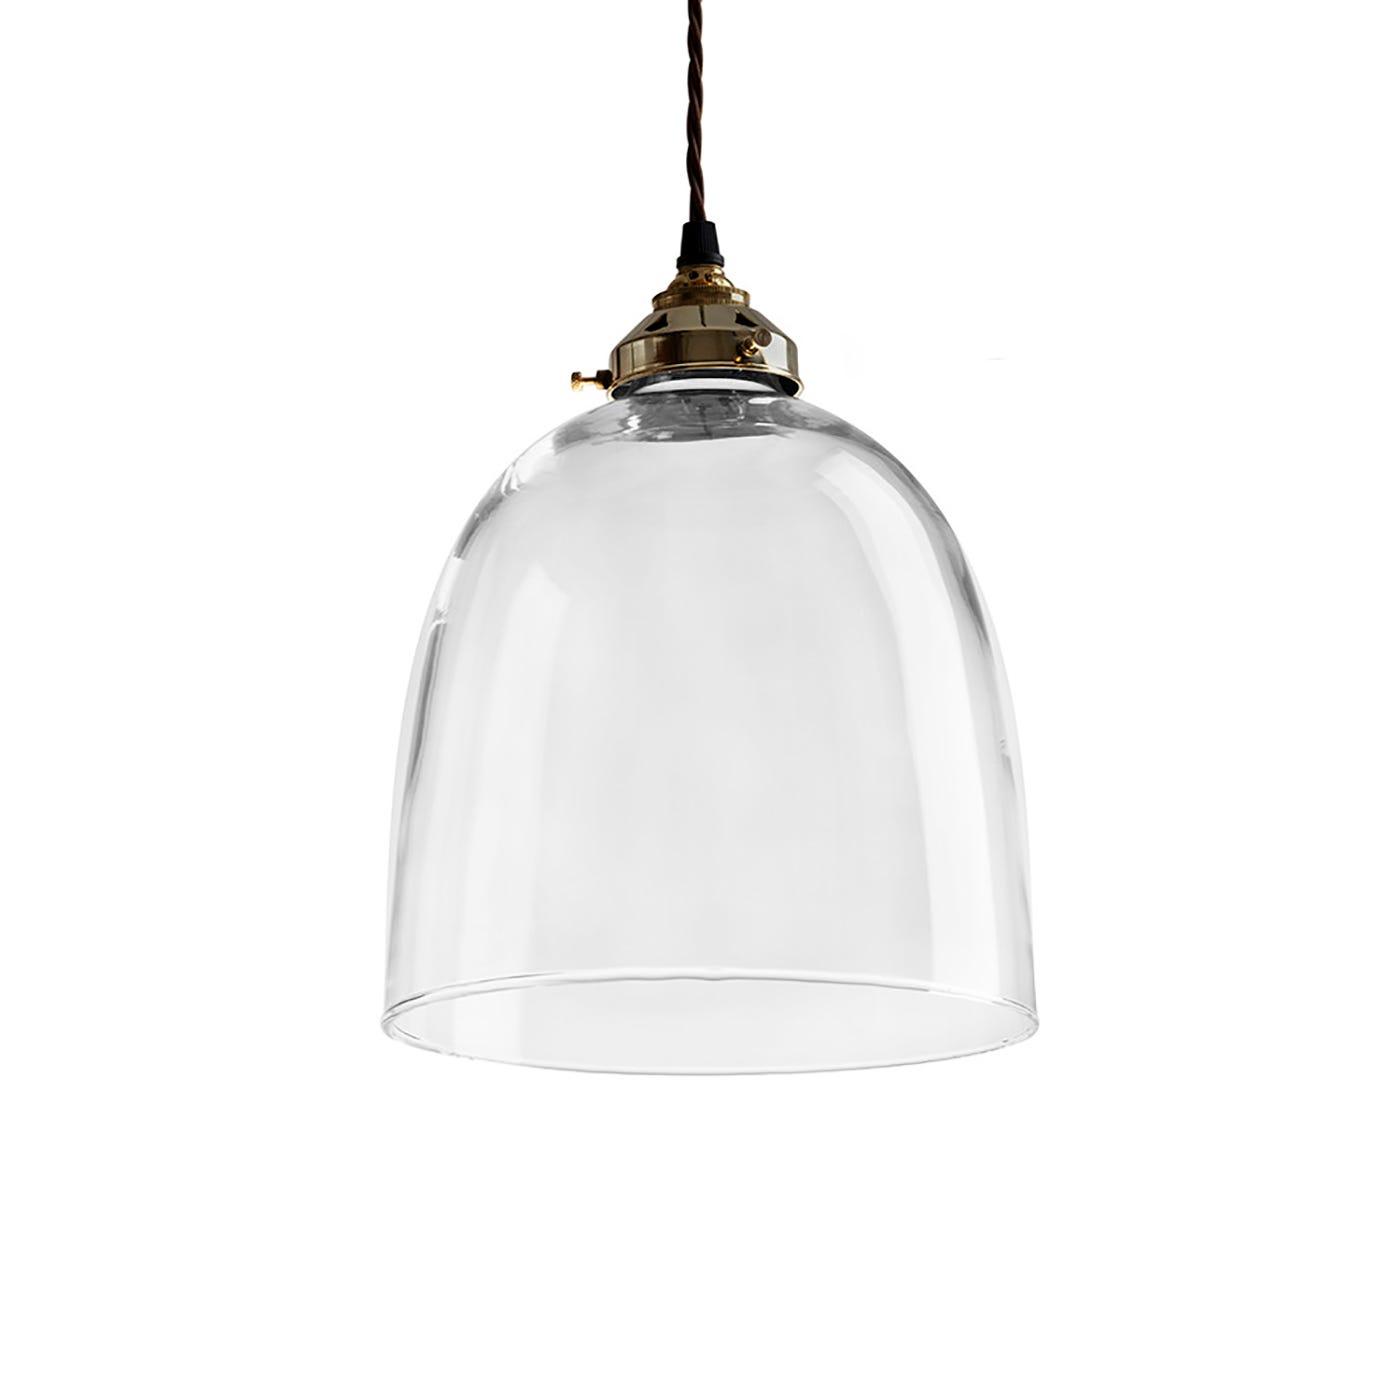 Metal Pendant Lighting Glass Bell Pendant Light Antique Metal Fittings Extra Large